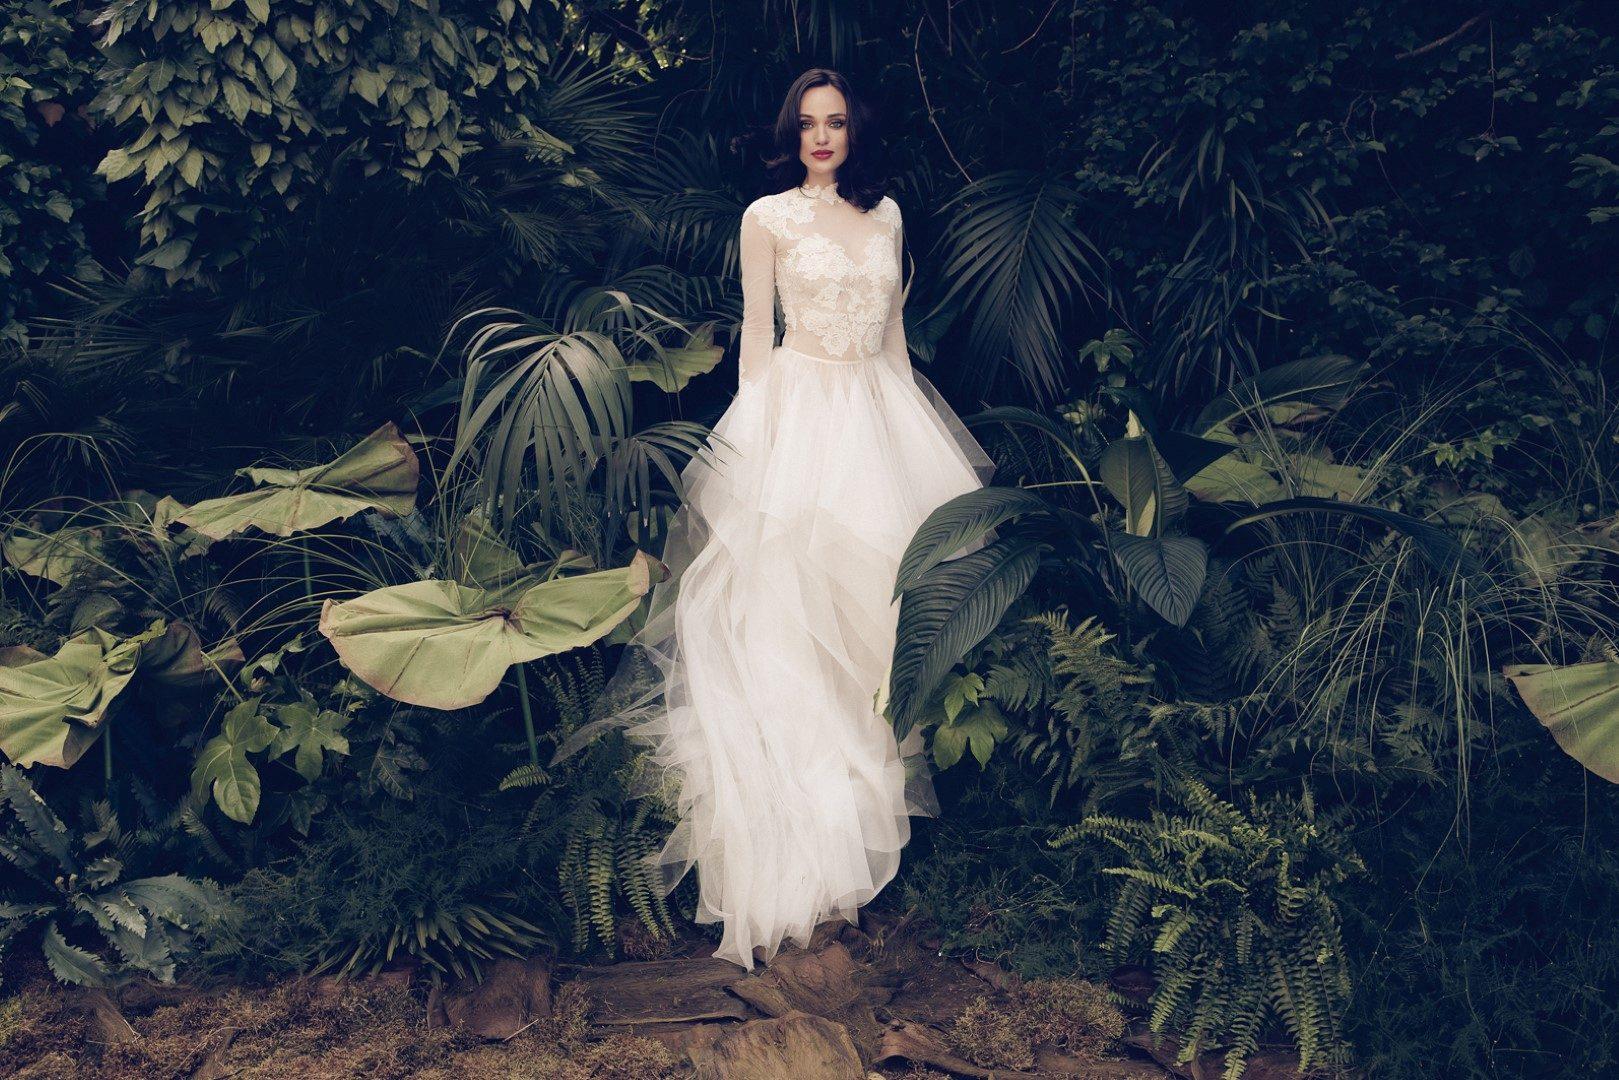 ,behind the secenes,backstage,daalarna,új kollekció,daalarna új kollekció,paradise,daalarna paradise,esküvői ruha,alkalmi ruha,esküvői ruhák,alkalmi ruhák,esküvő 2017,esküvői ruha 2017,menyasszonyi ruha,menyasszony,esküvő a tengerparton,esküvő réten,esküv